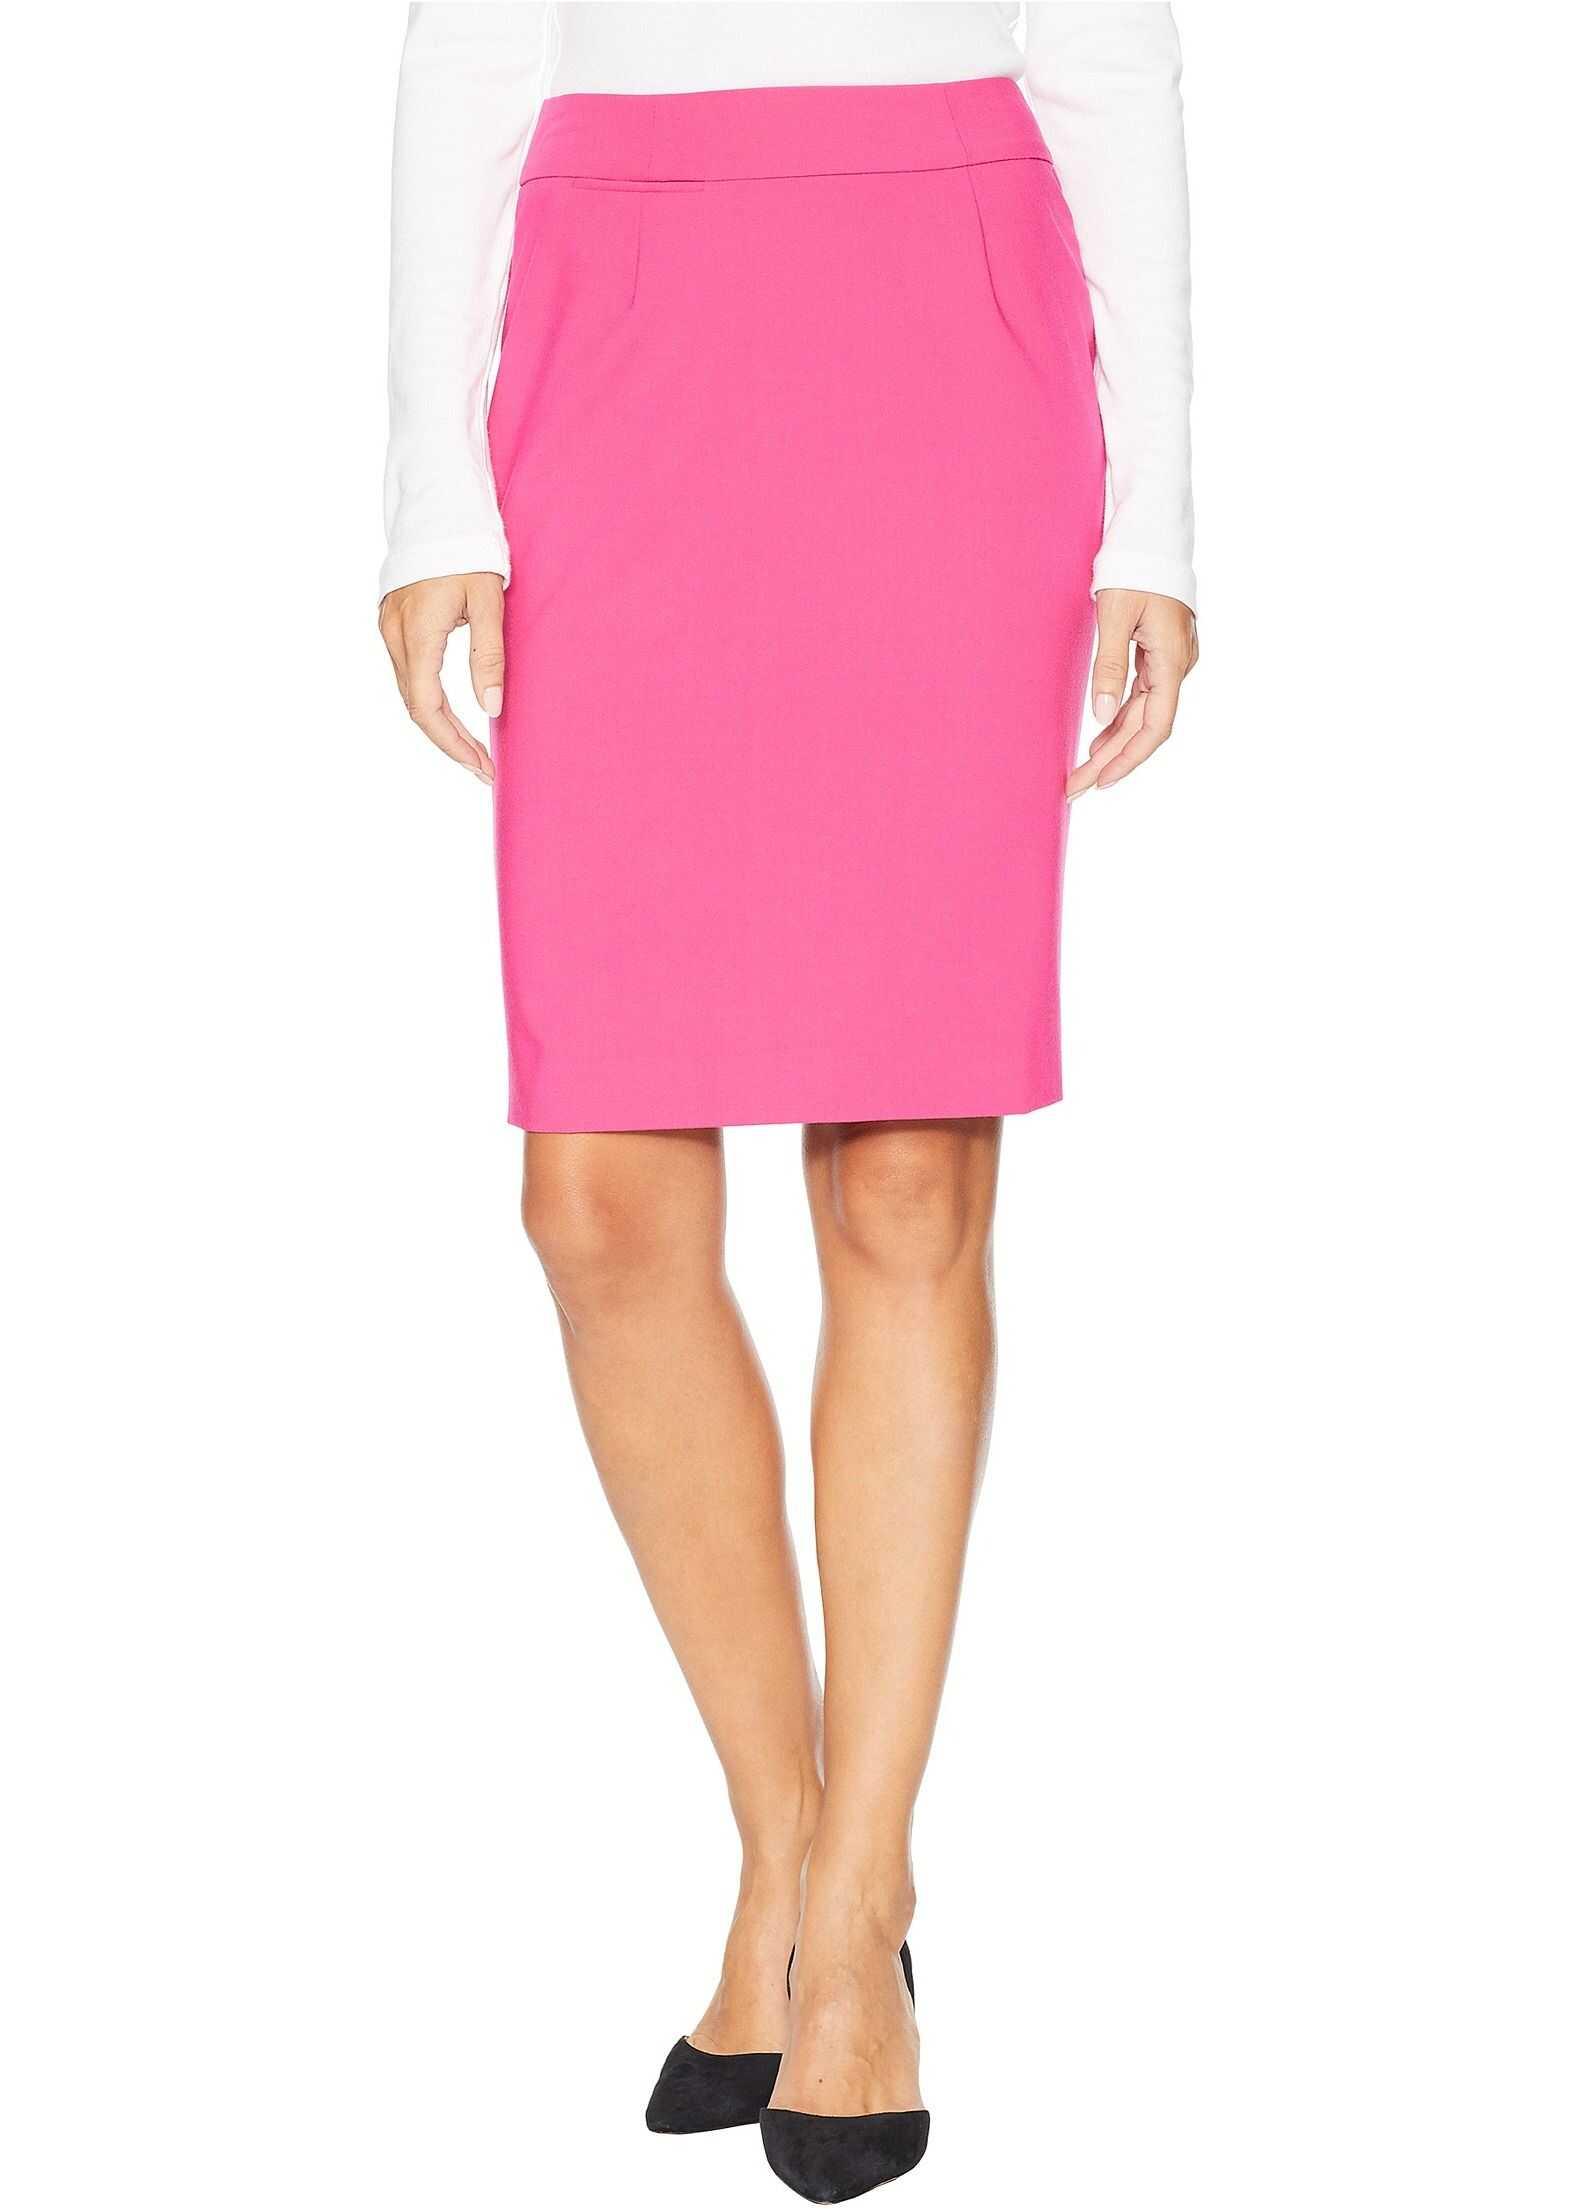 Calvin Klein Woven Skirt Hibiscus